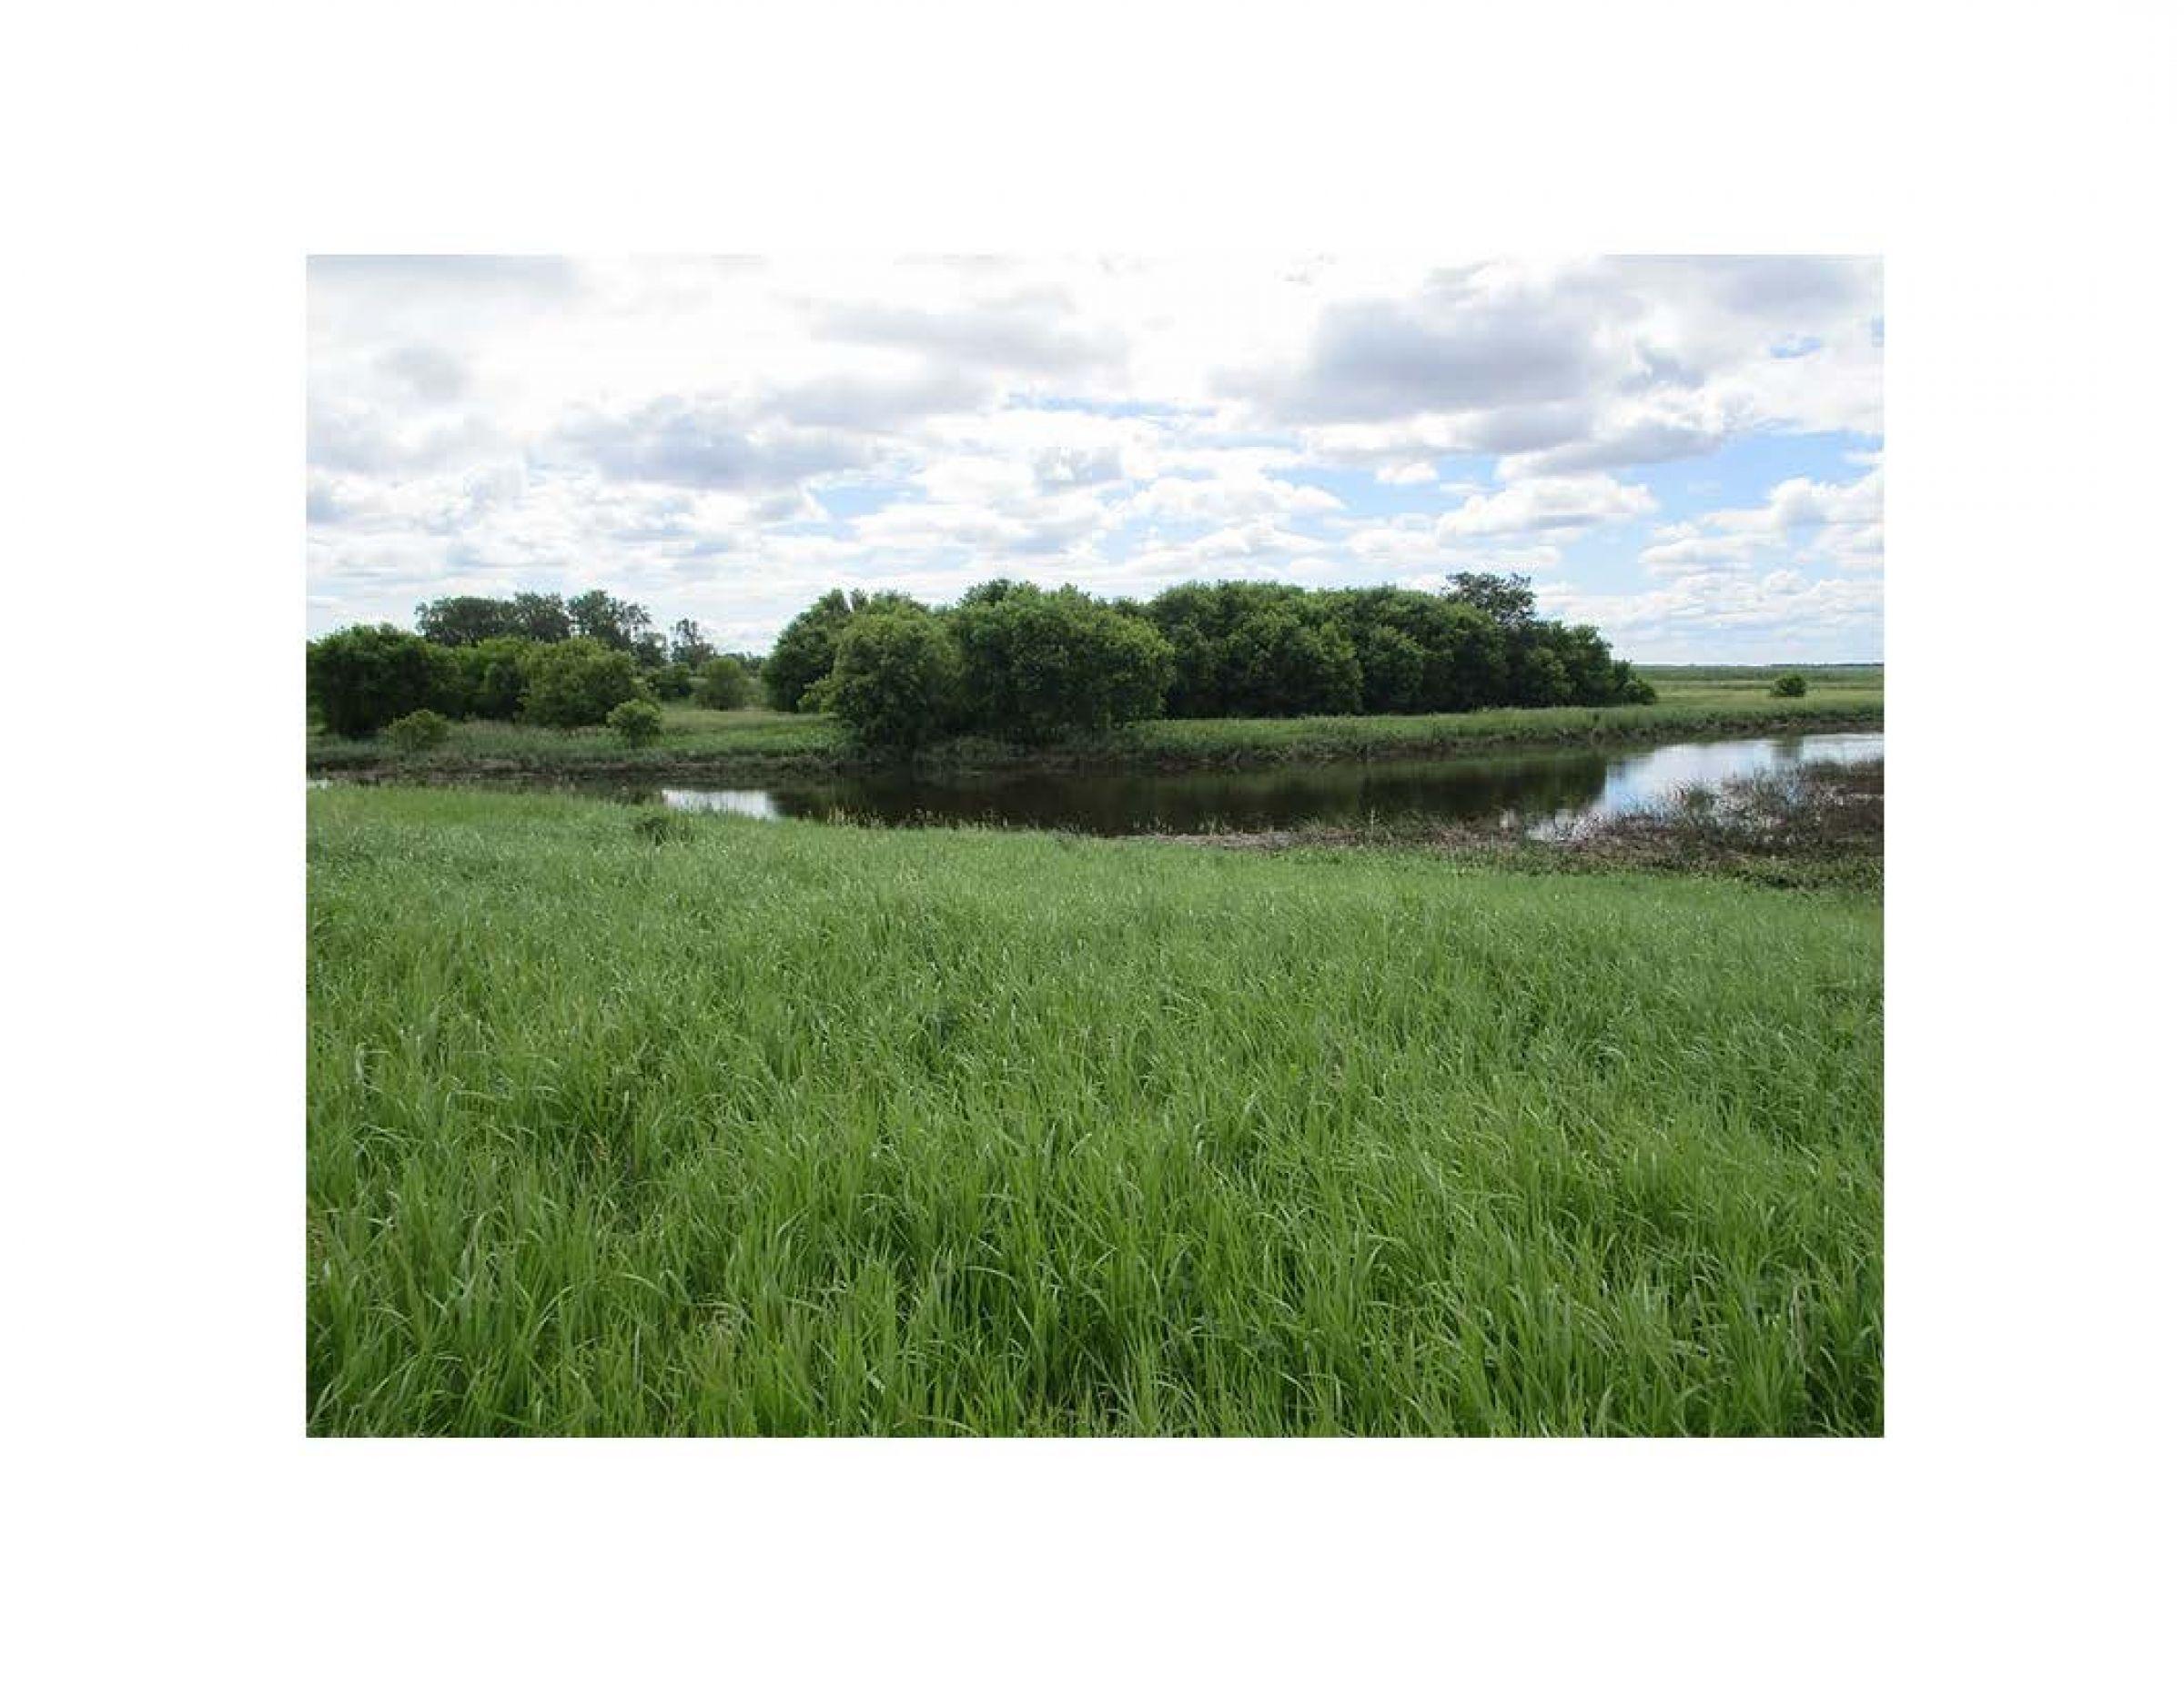 land-traill-county-north-dakota-25-acres-listing-number-15613-2-2021-06-24-191717.jpg